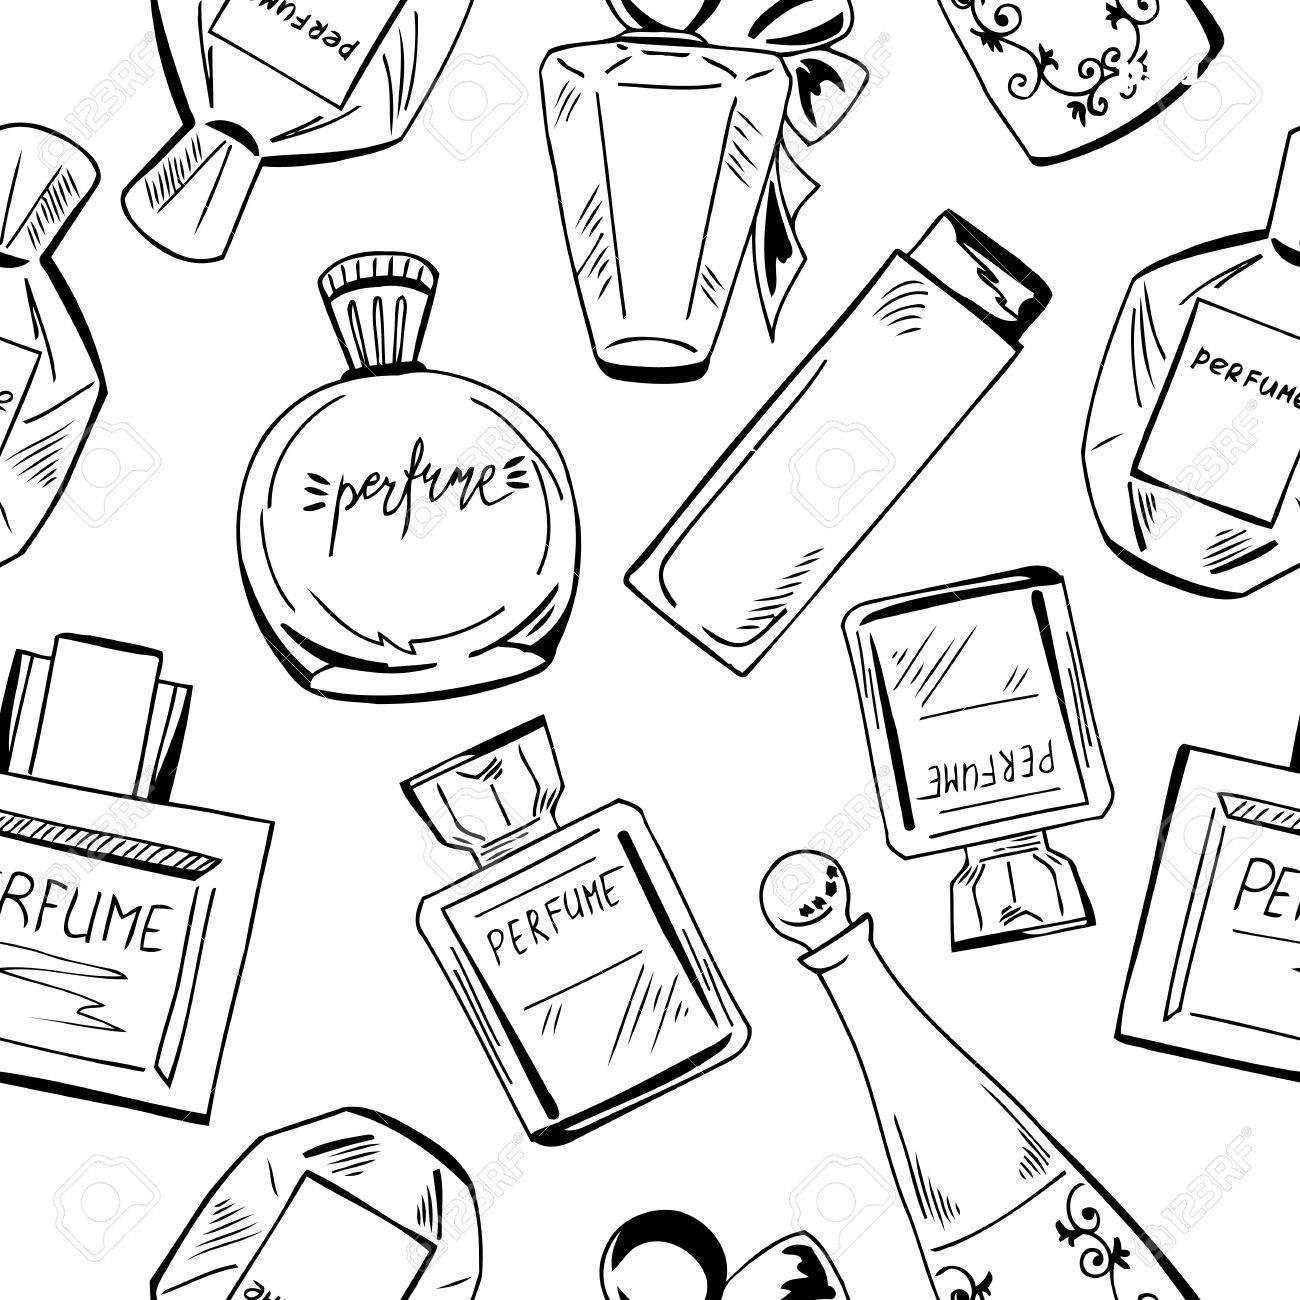 1300x1300 Perfume Bottle Background. Black And White Illustration. Graphic